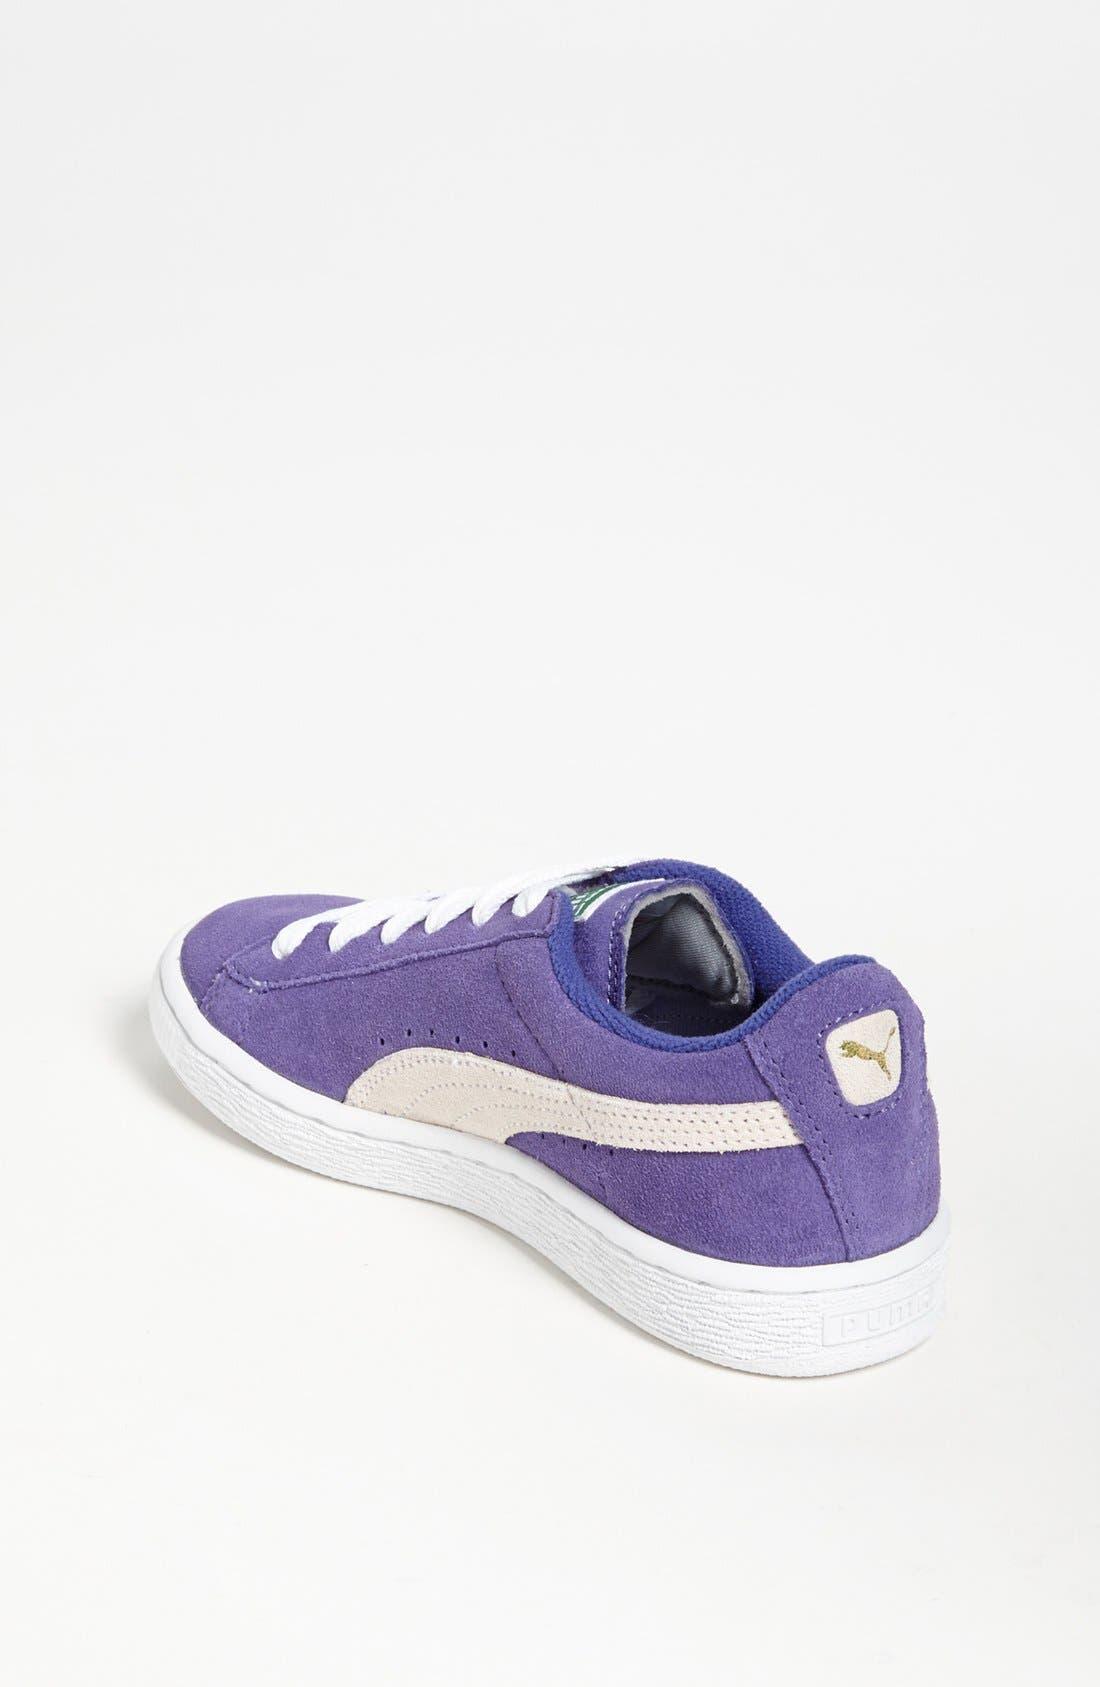 Alternate Image 2  - PUMA 'Jr.' Suede Sneaker (Toddler, Little Kid & Big Kid)